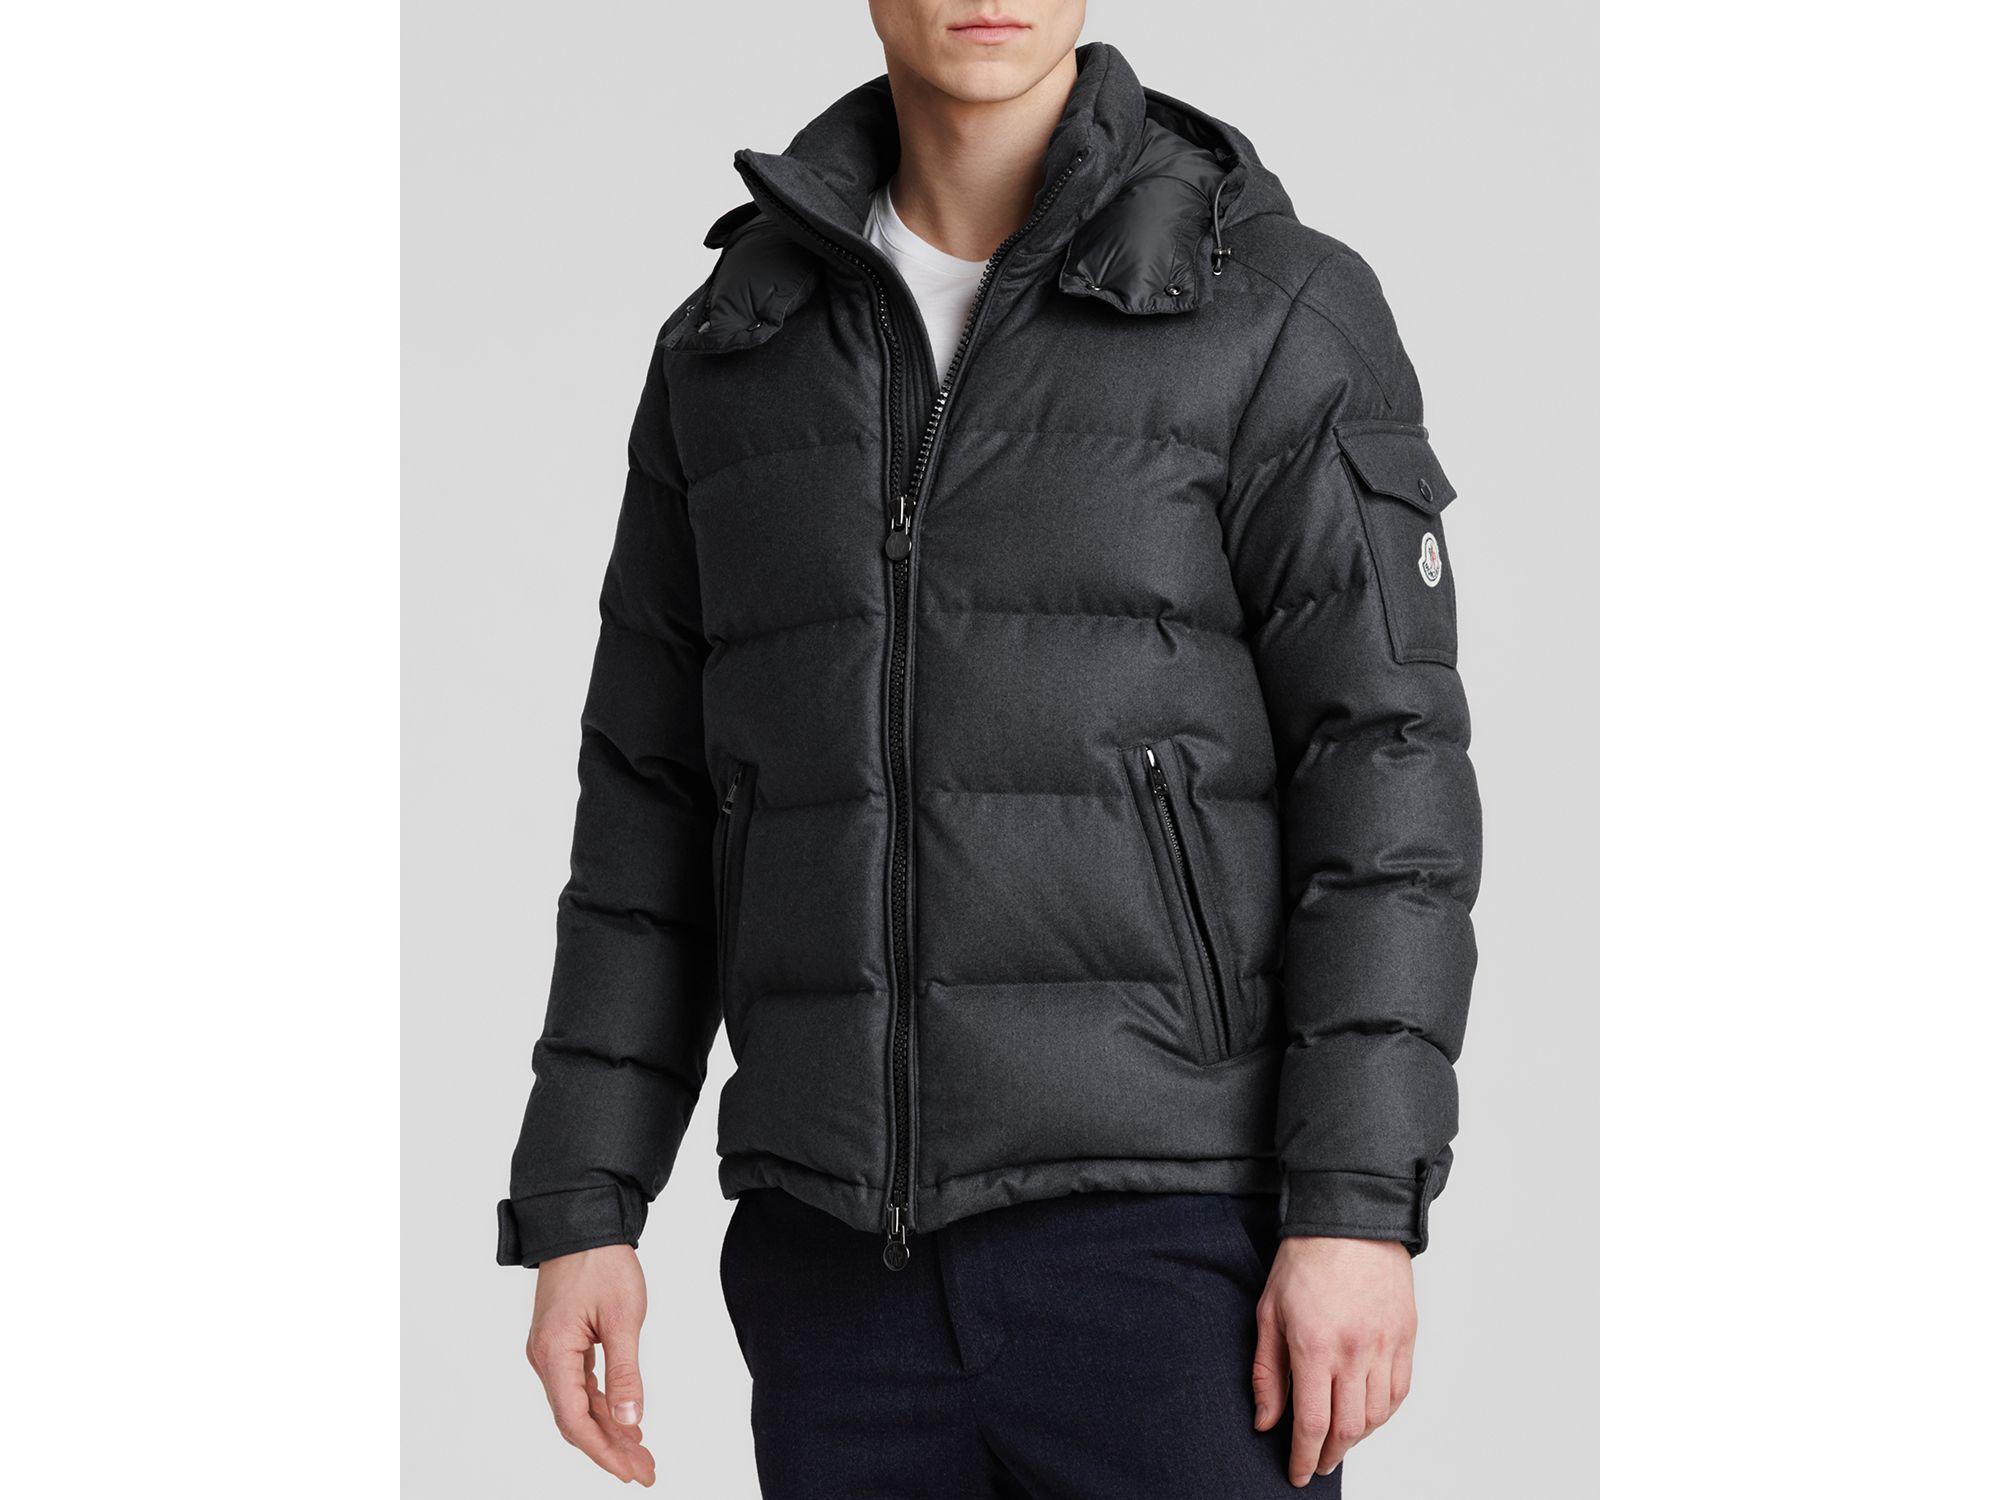 Lyst - Moncler Montgenevre Down Jacket in Gray